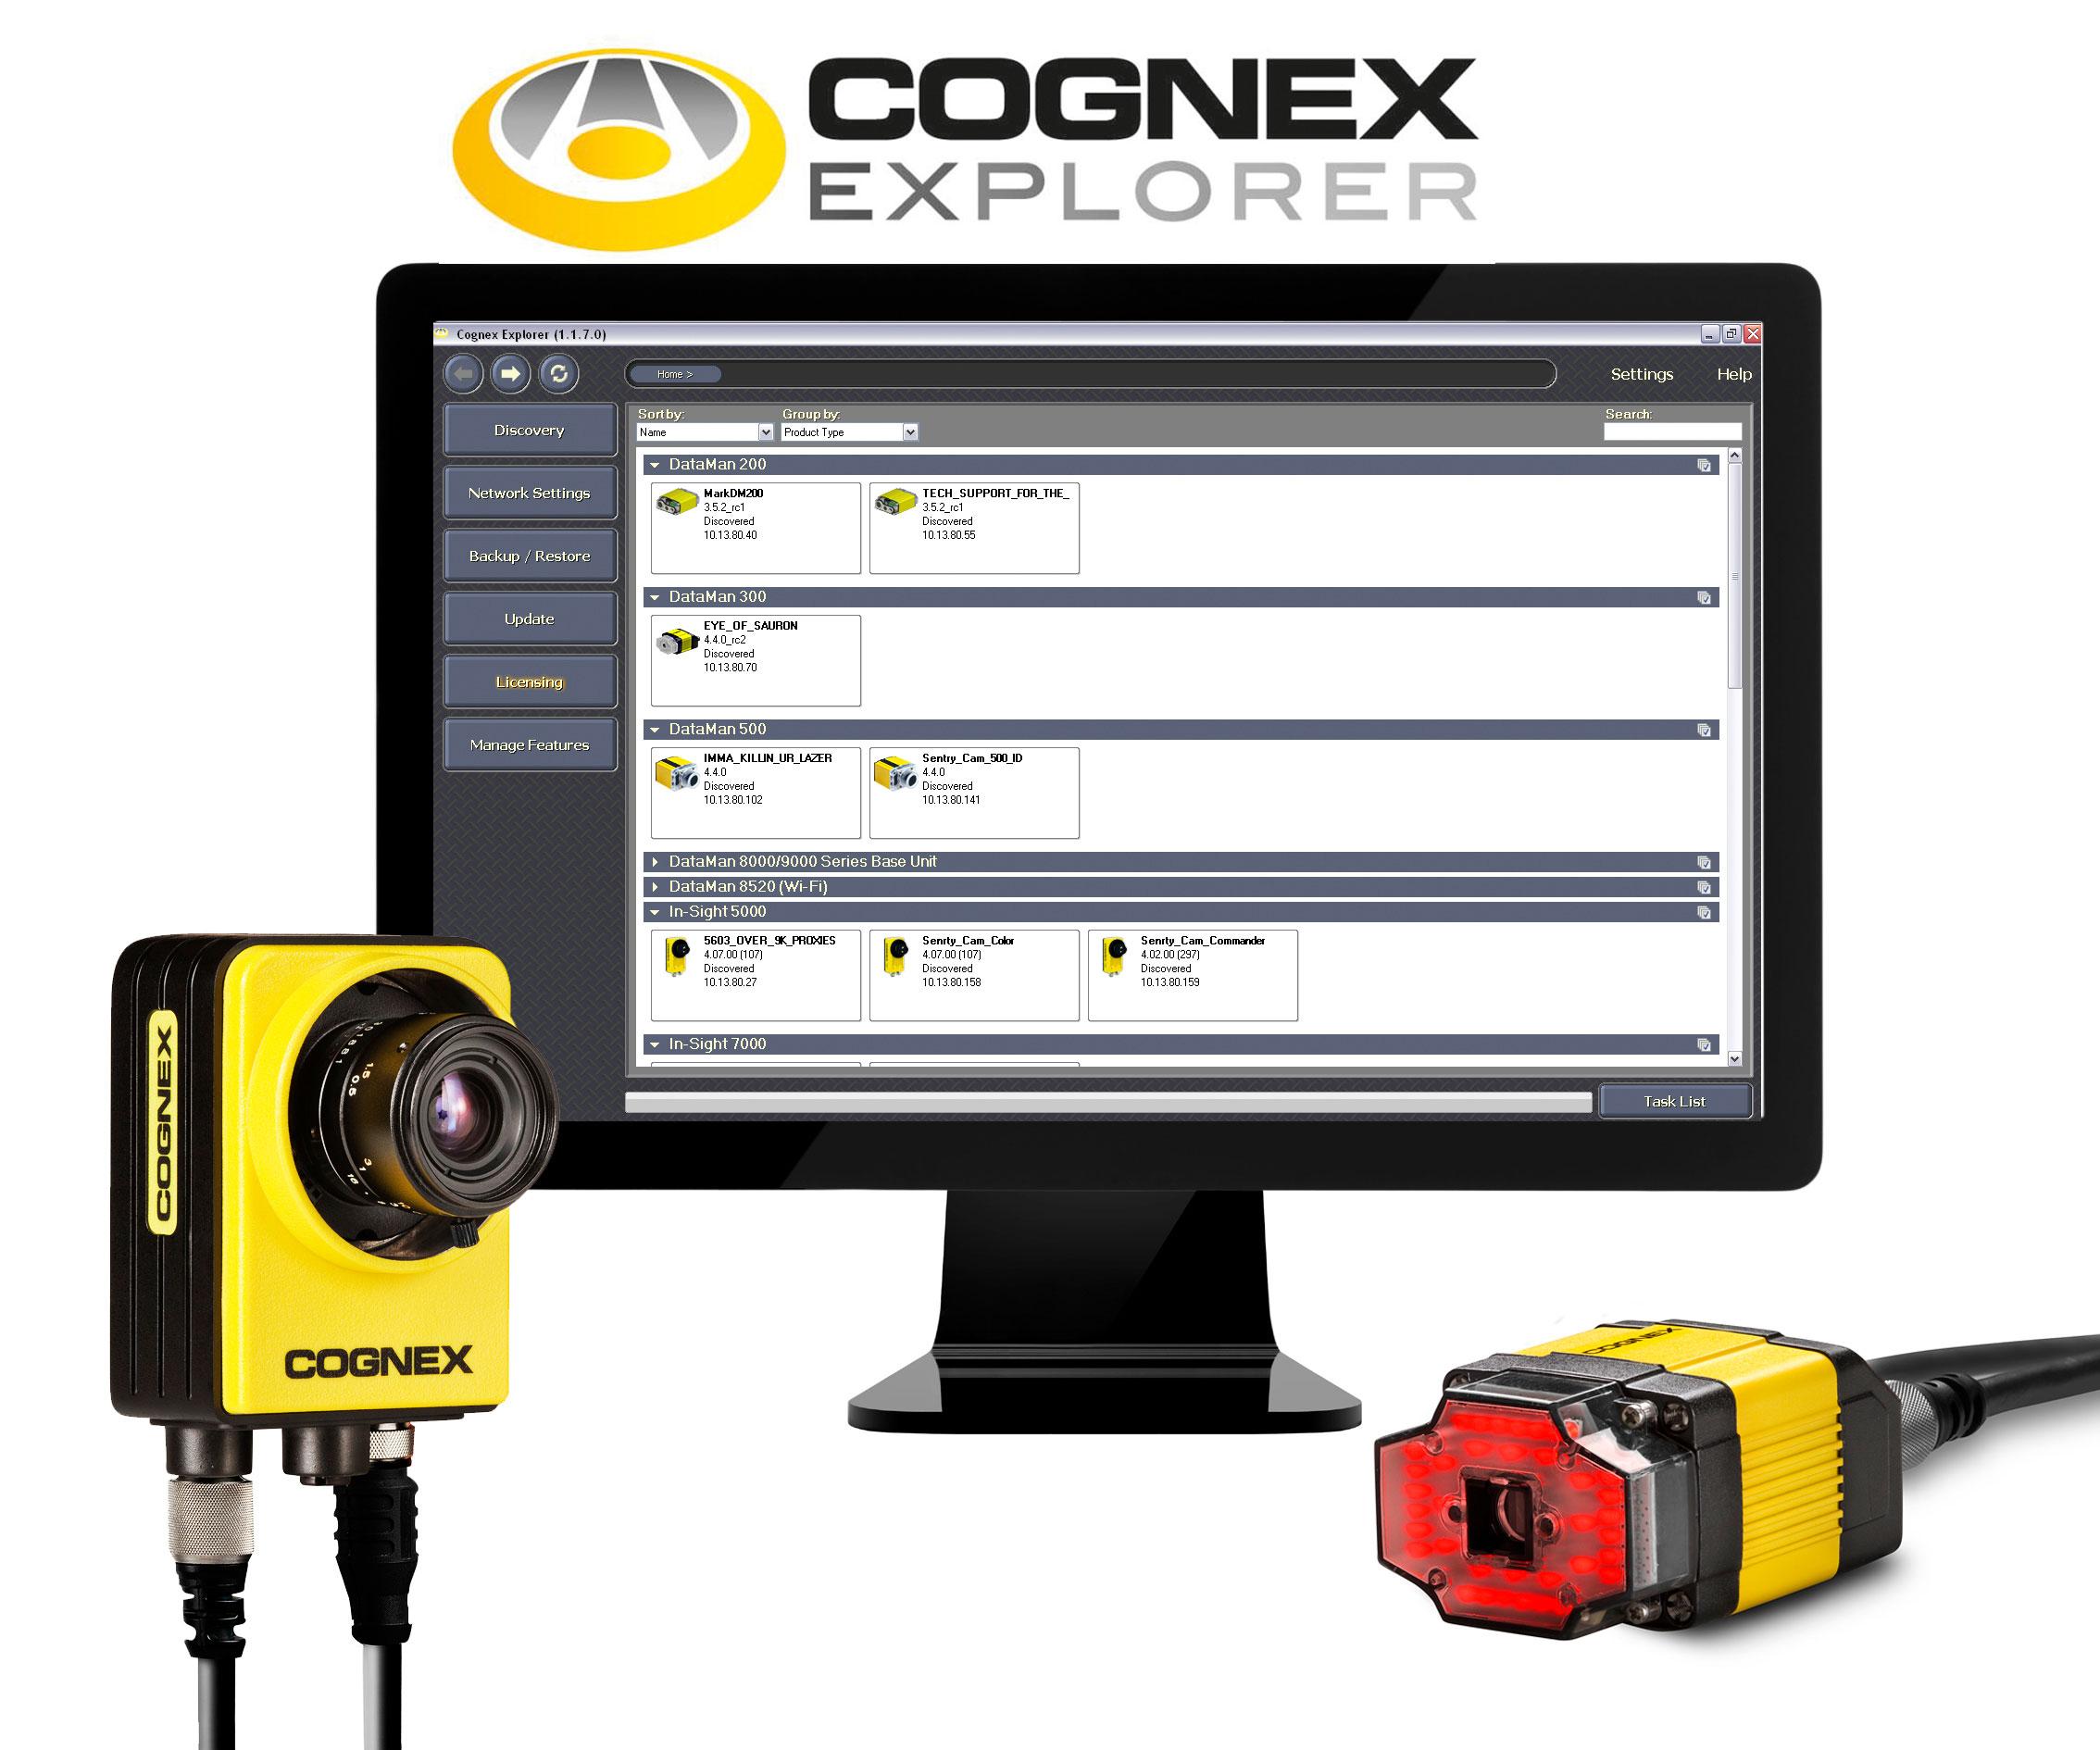 Cognex_Explorer_PR